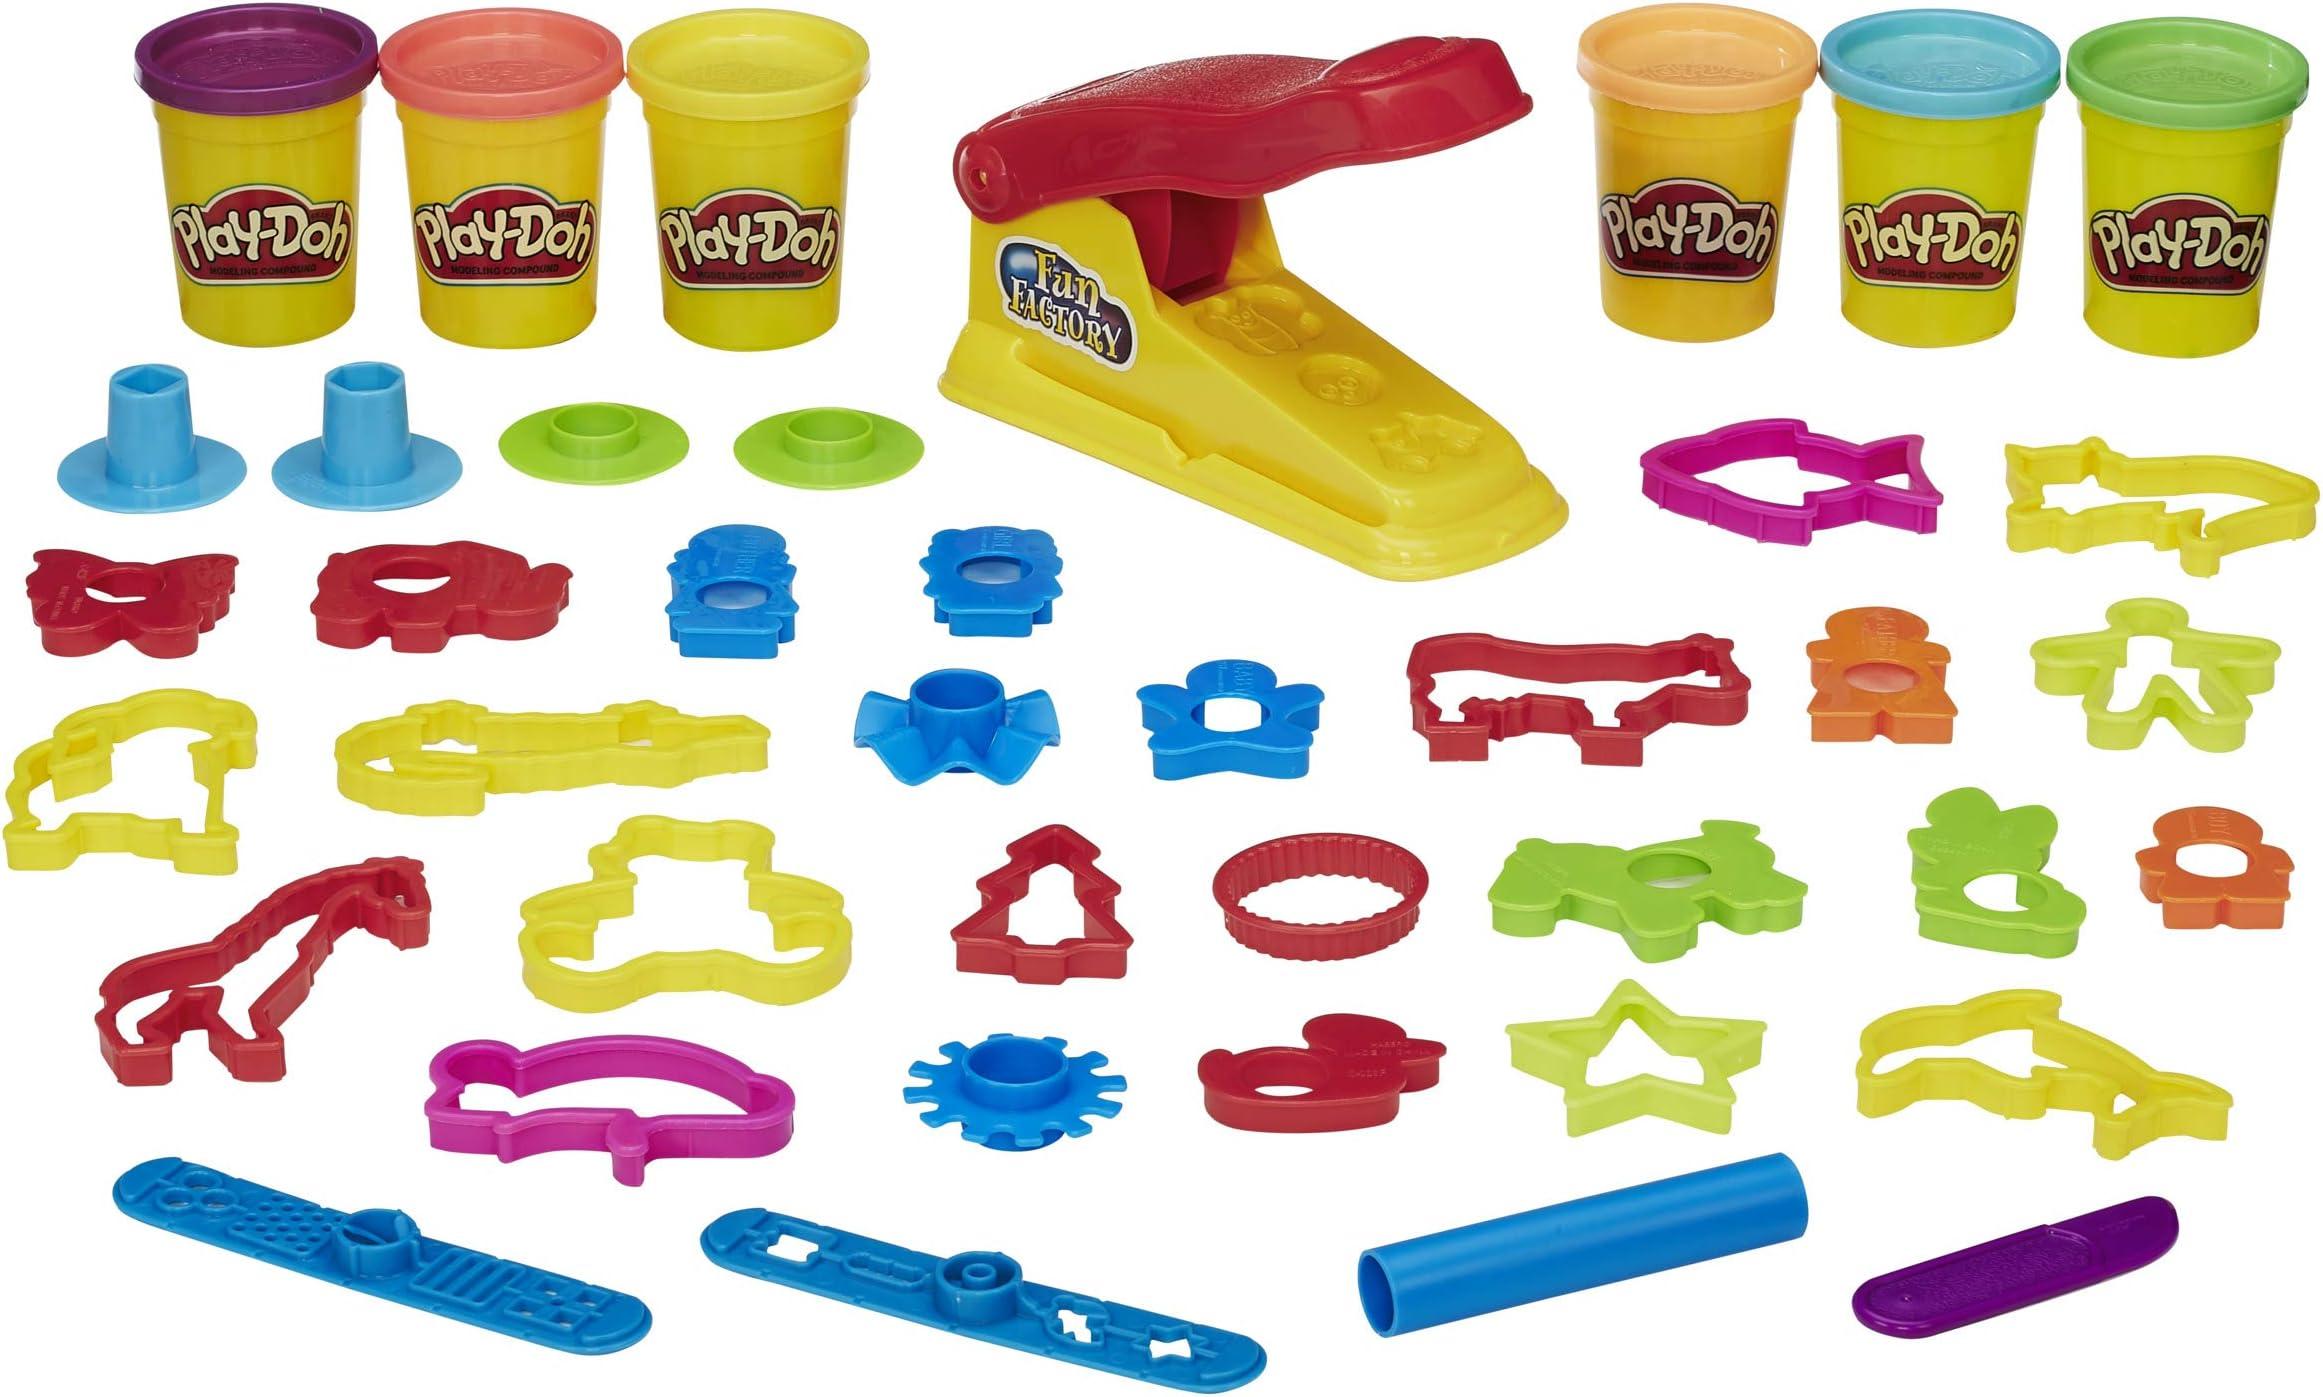 Dog Play Dough Sensory Set For Speech Language Development Kit Pet Child Boy Girl Party Gift Water Toy Pretend Creative Play Educational